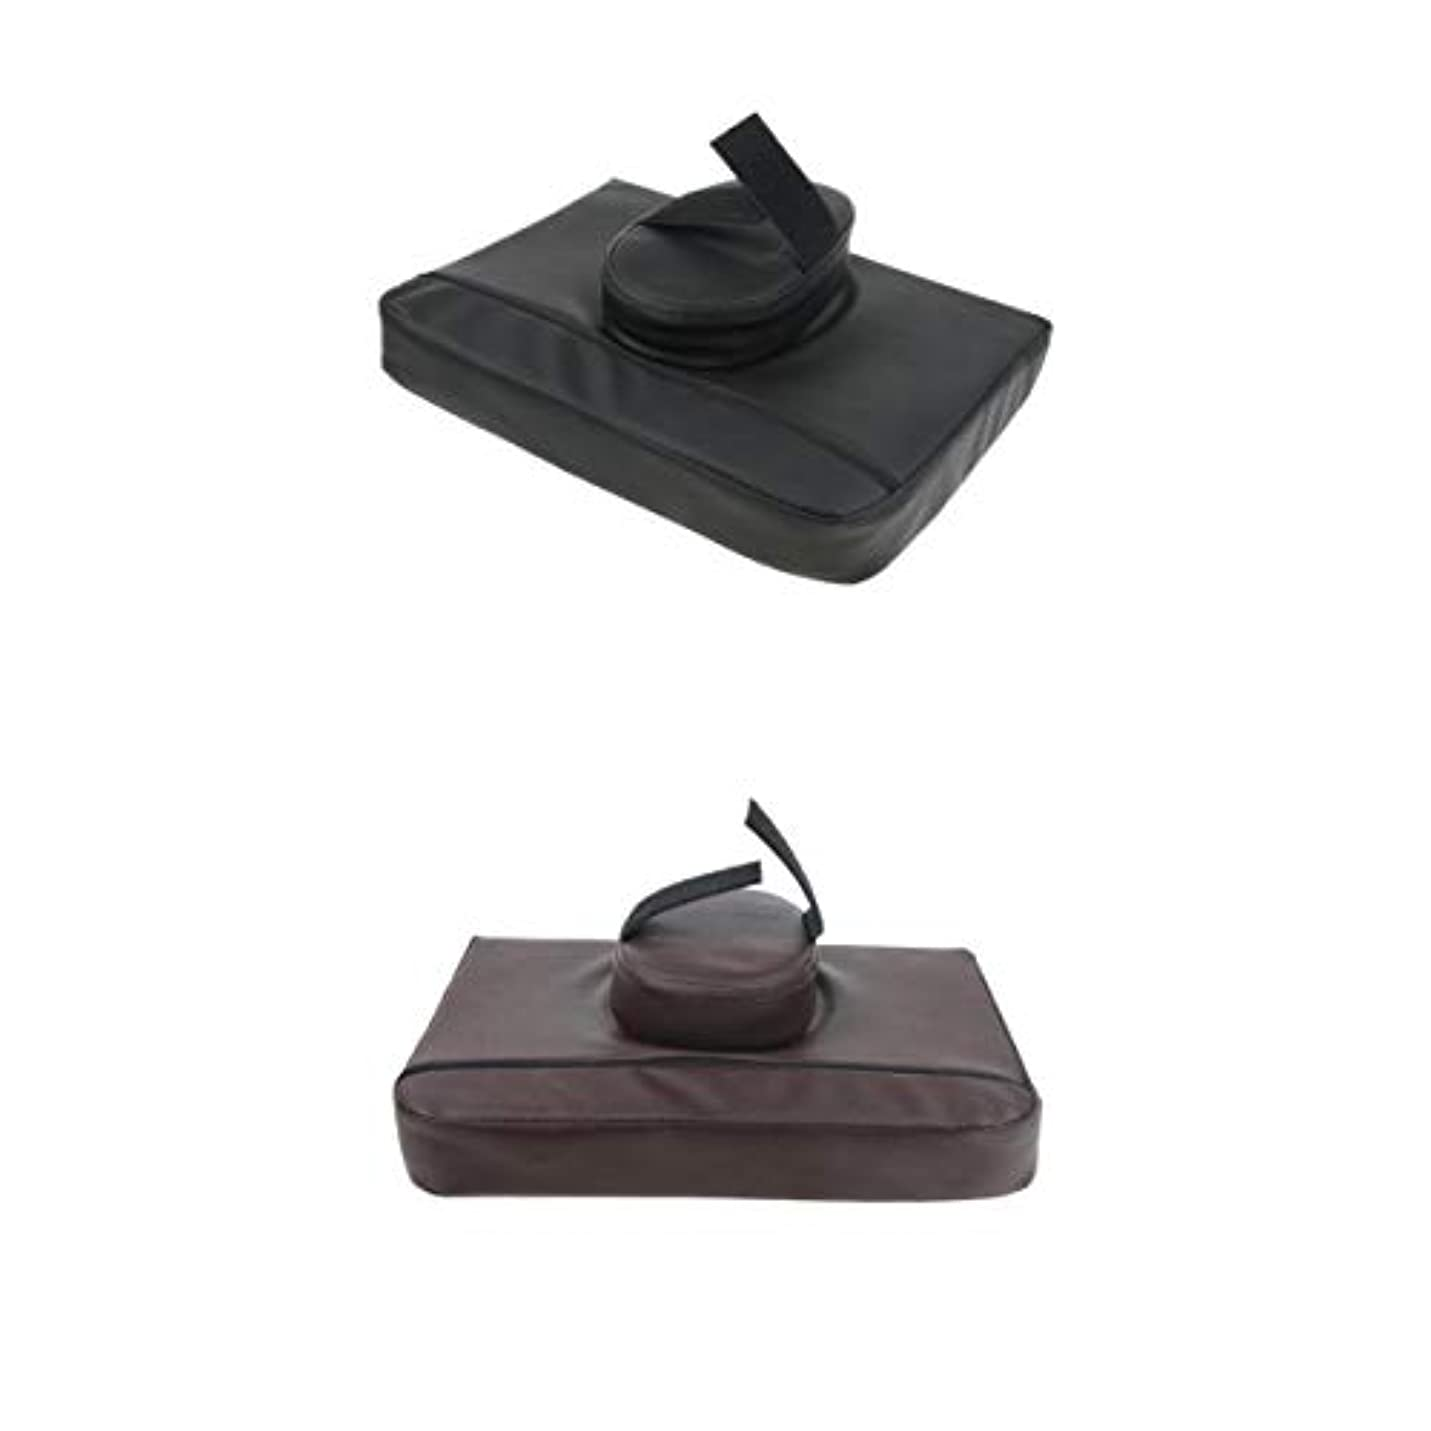 Fenteer マッサージクッション マッサージ枕 マッサージピロー スクエア マッサージテーブル用 通気性 2個入